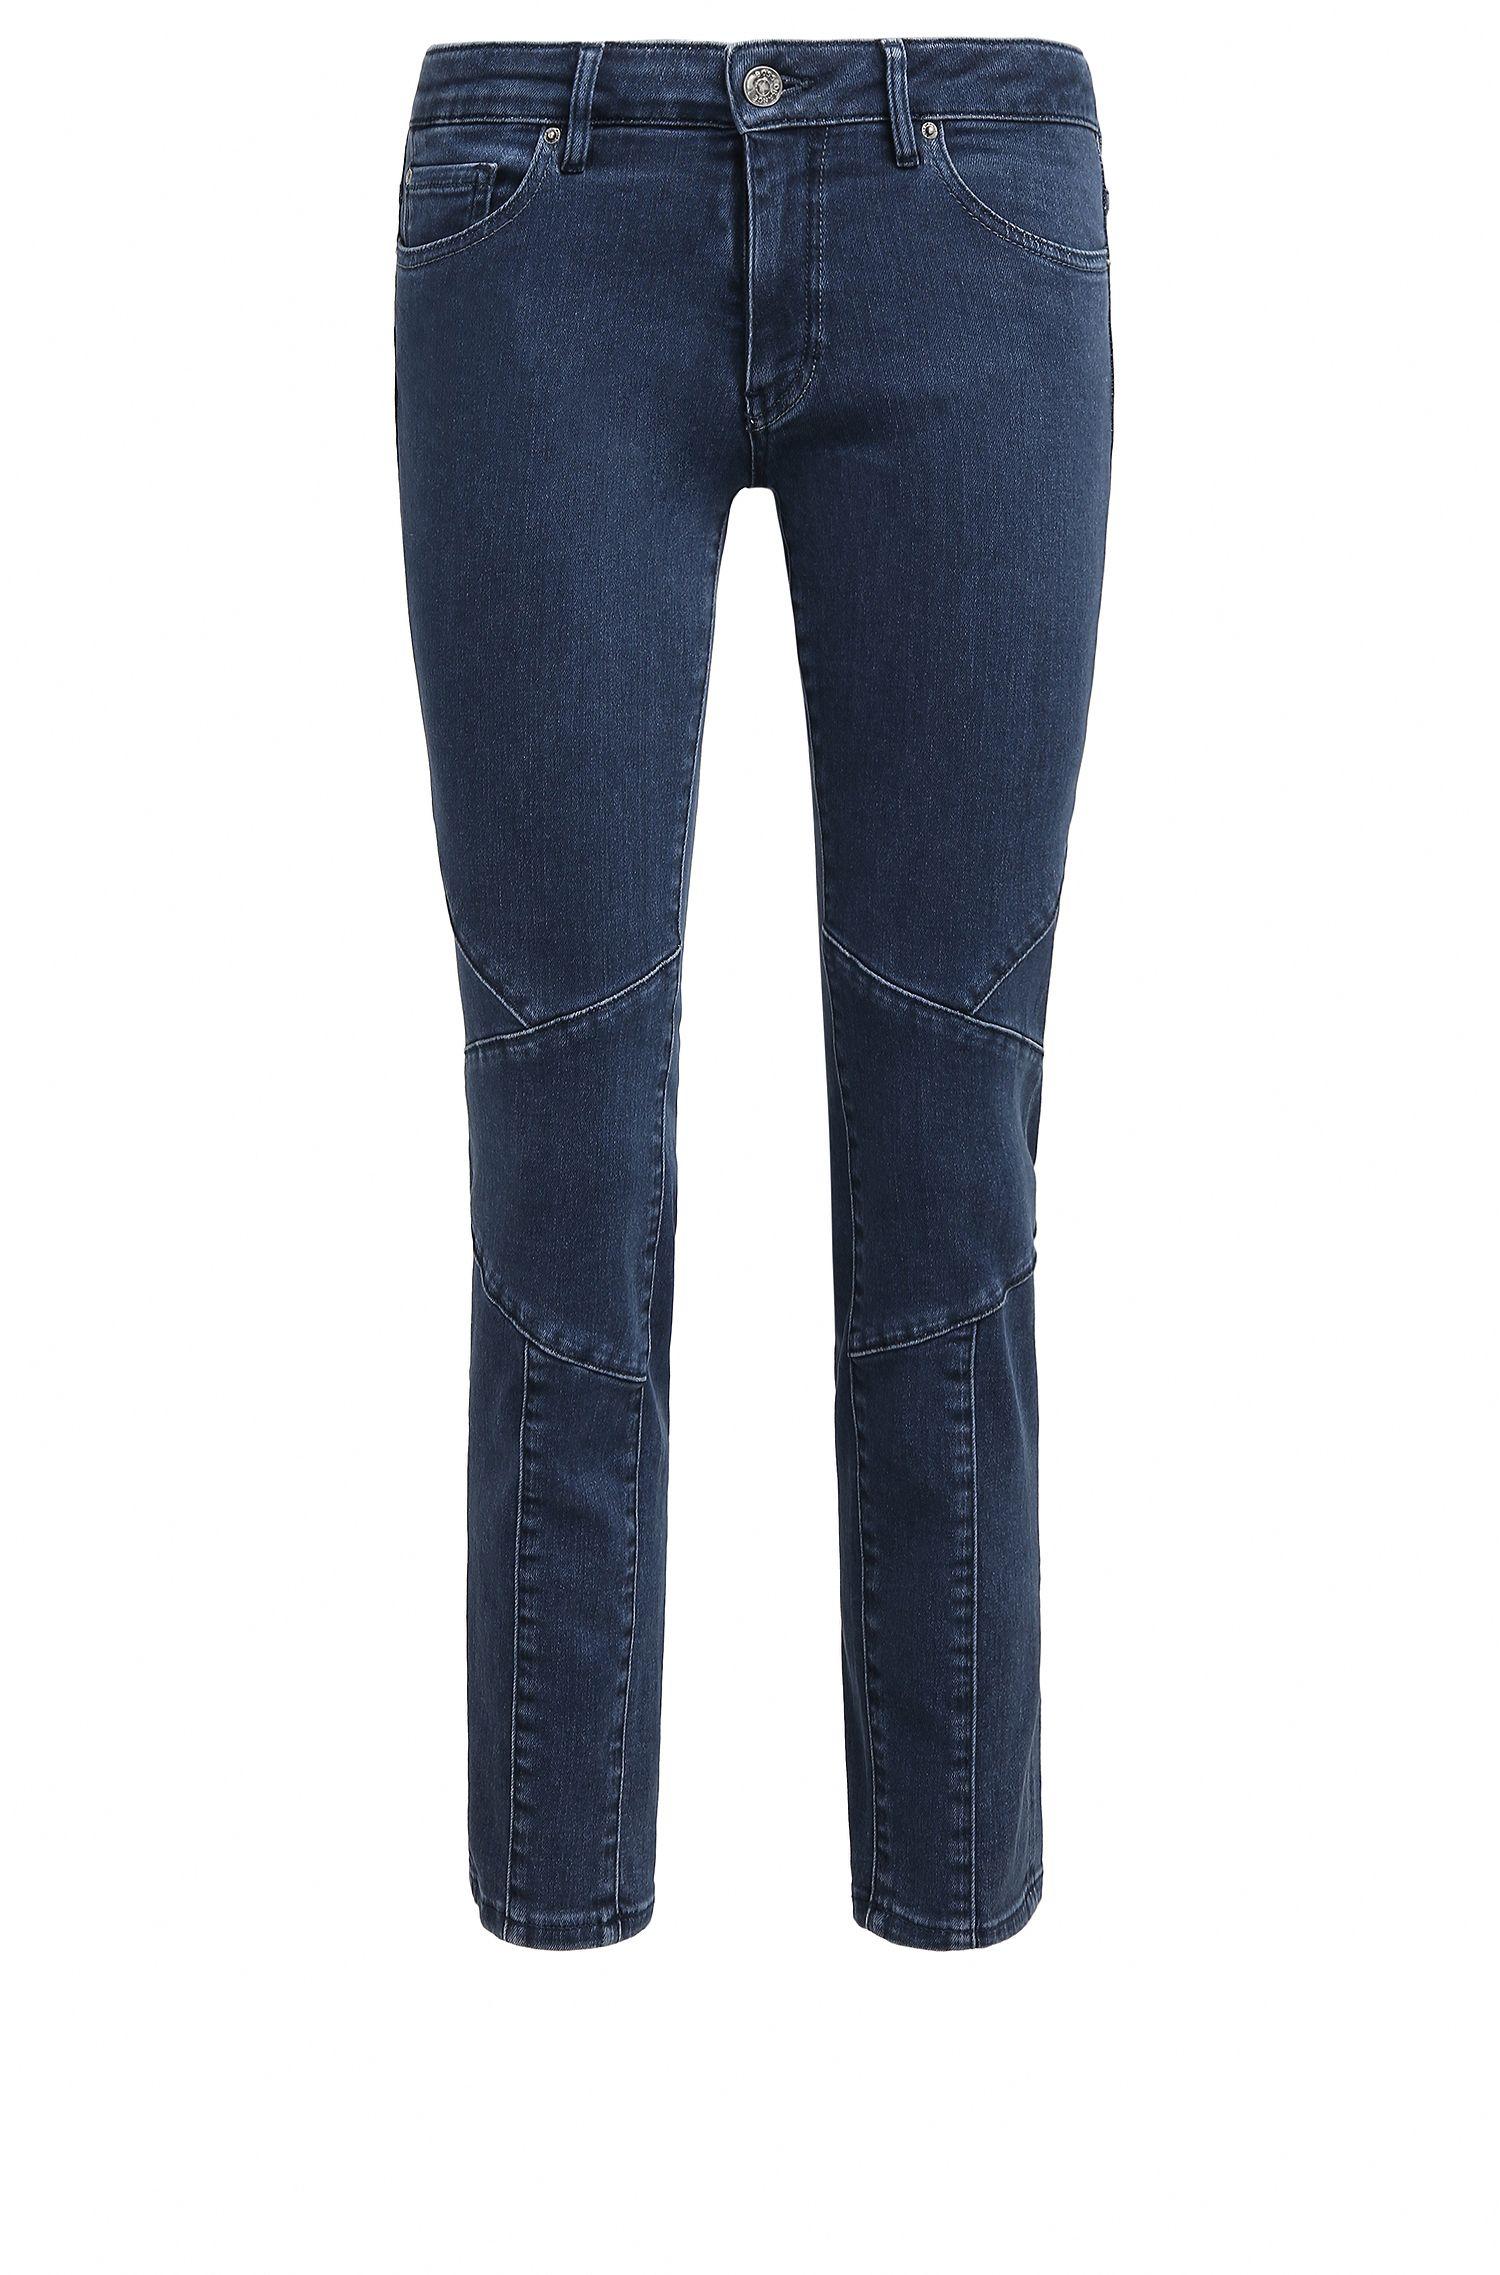 Jeans Slim Fit raccourci en denim power-stretch, au style biker